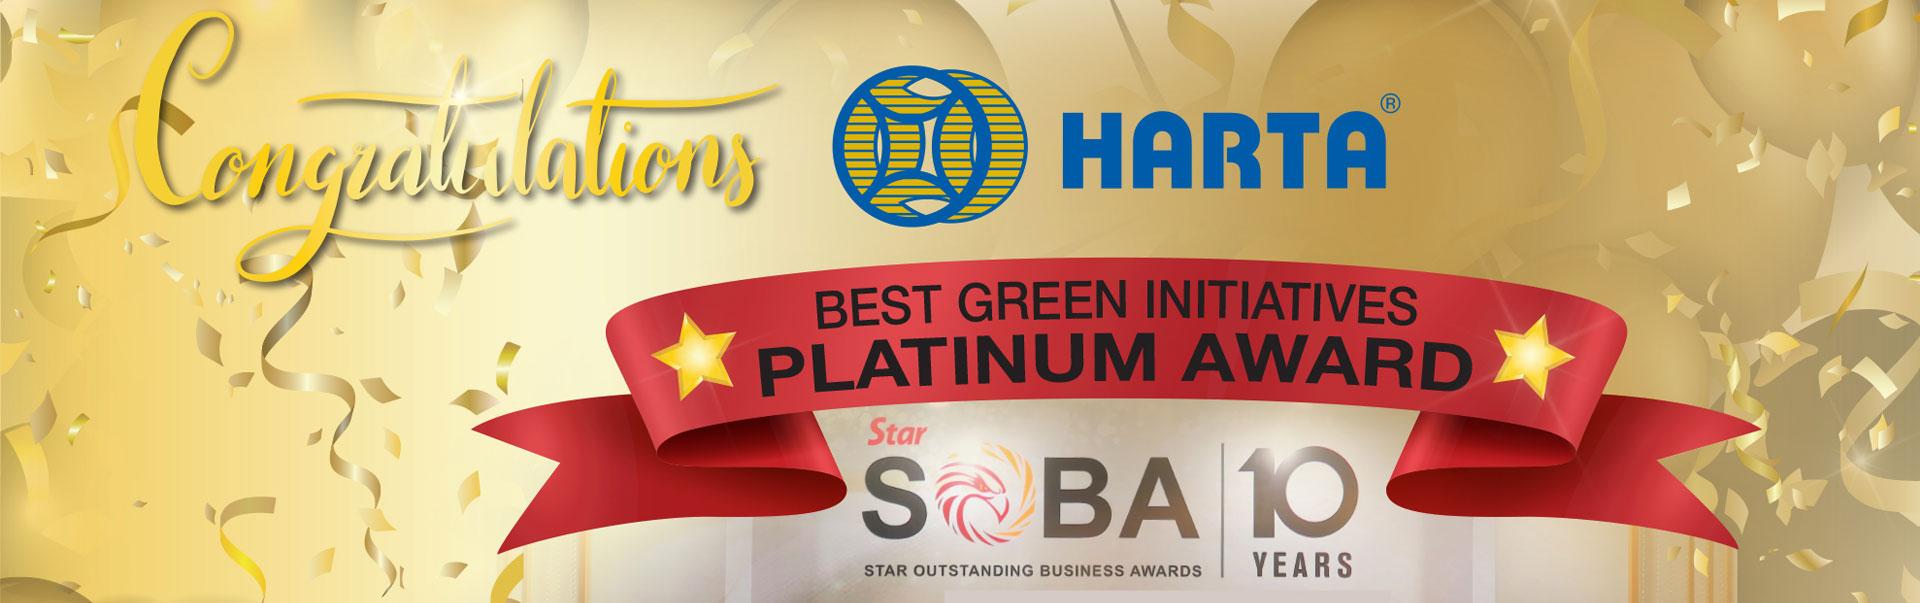 Harta Maintenance Sdn. Bhd.